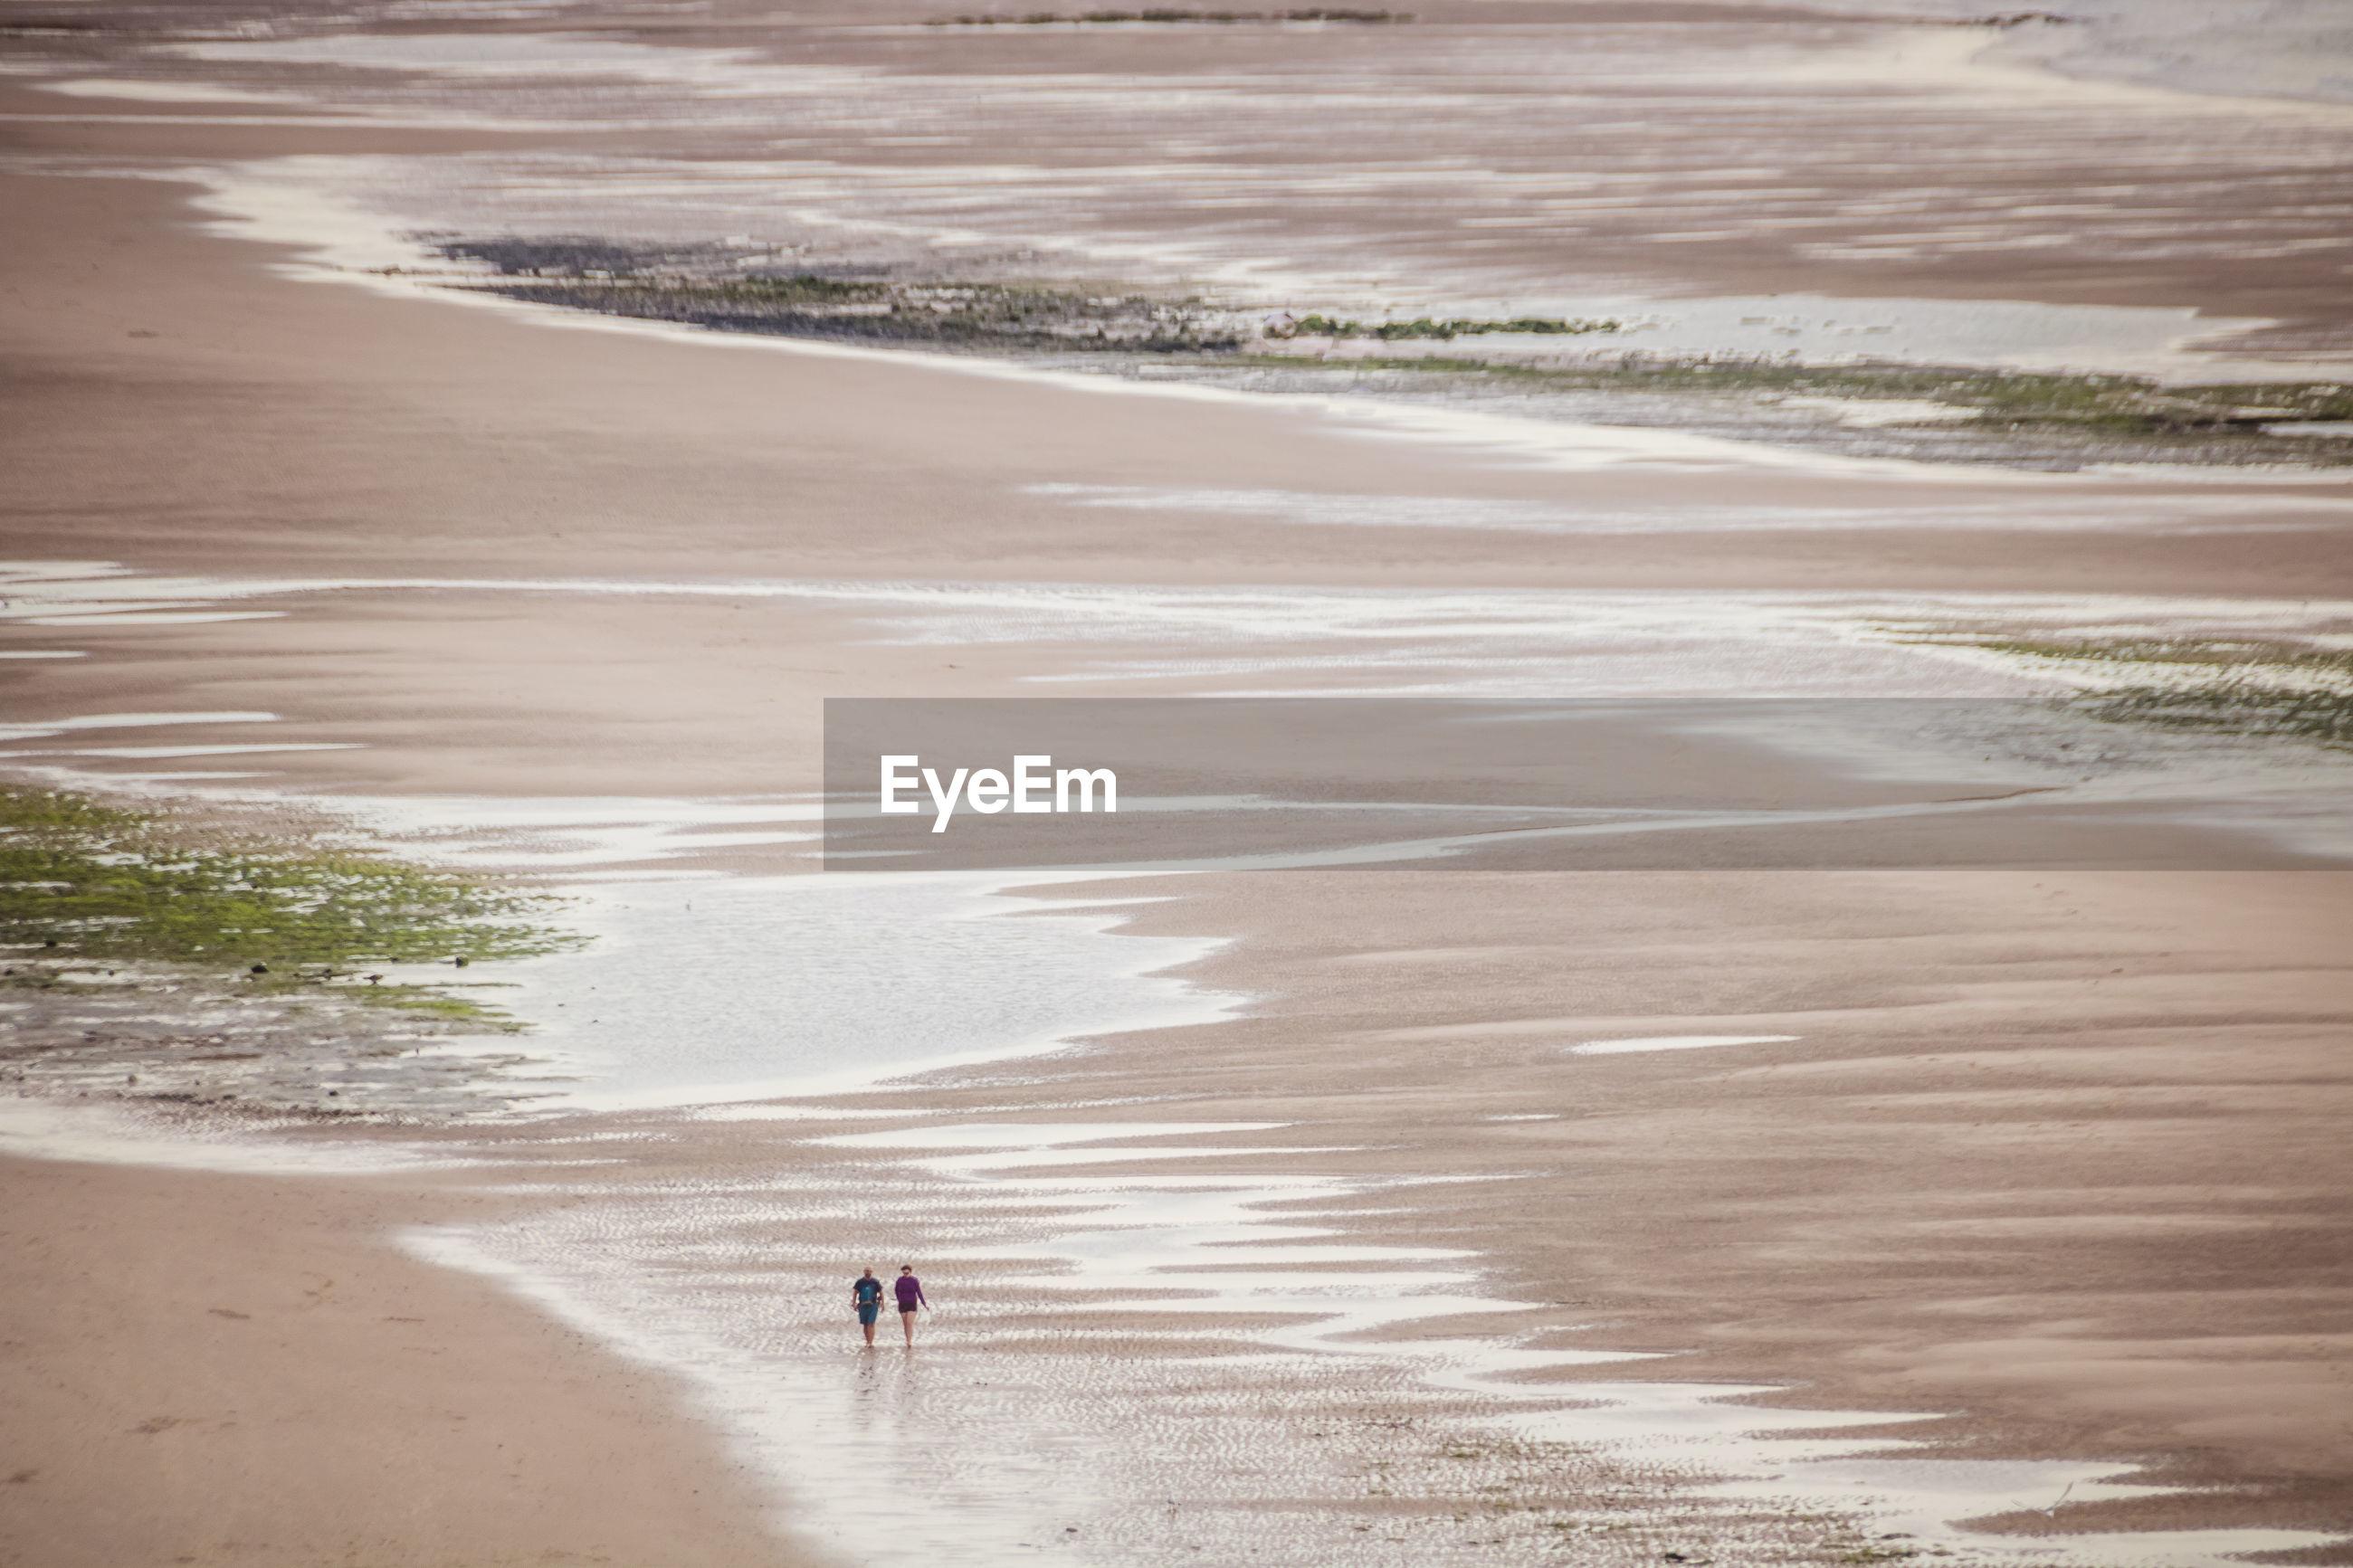 Aerial view of people walking at beach